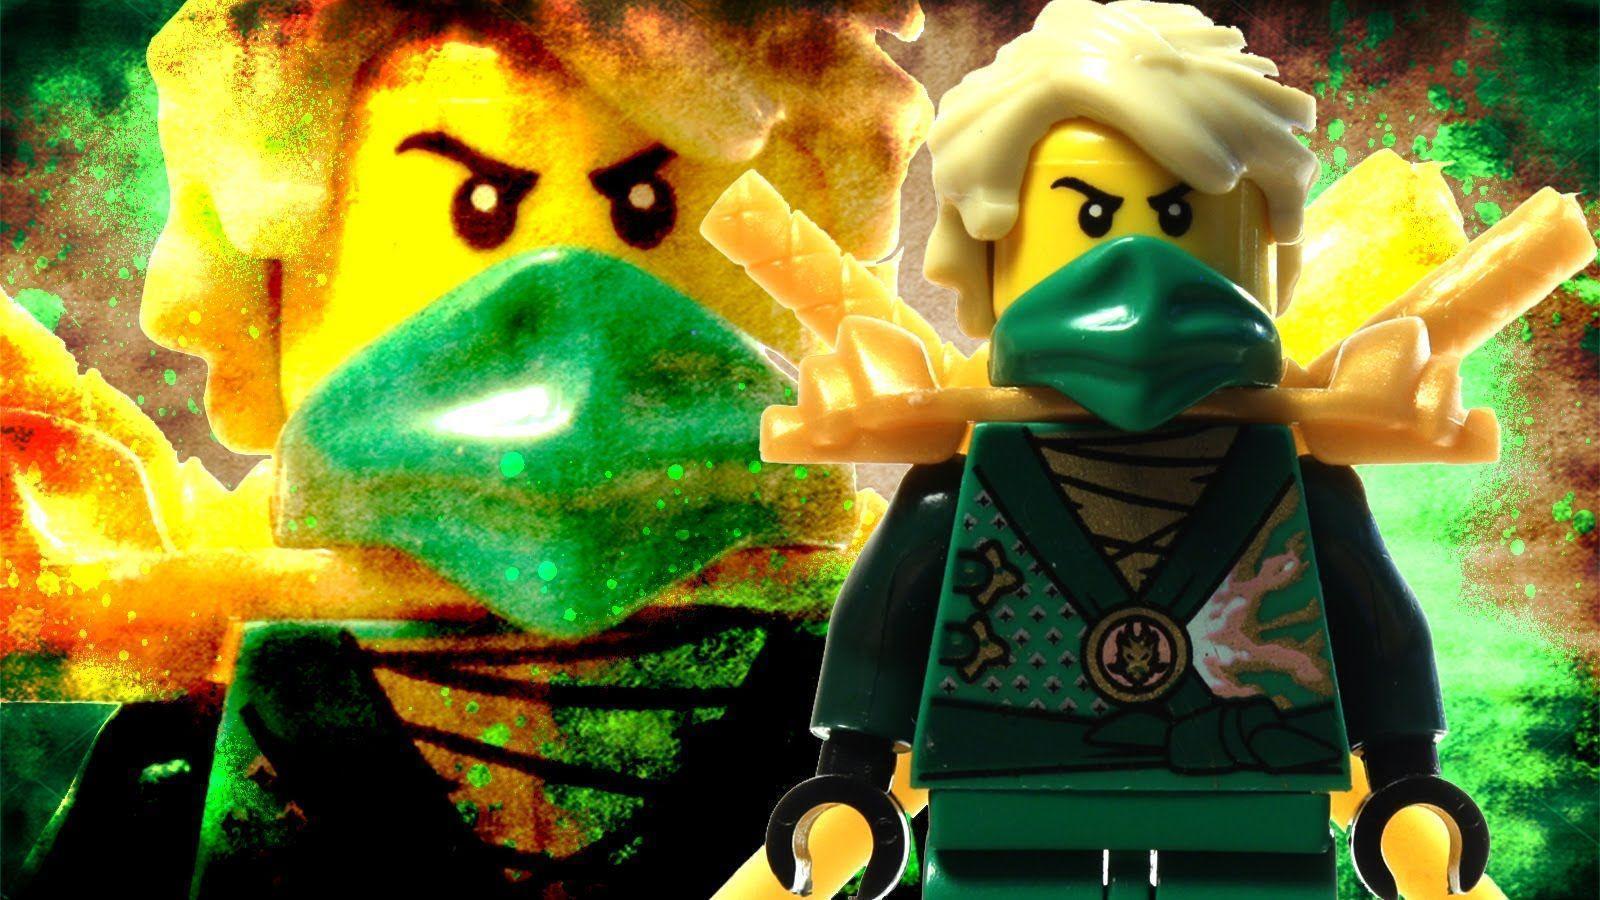 Lego Ninjago Wallpapers